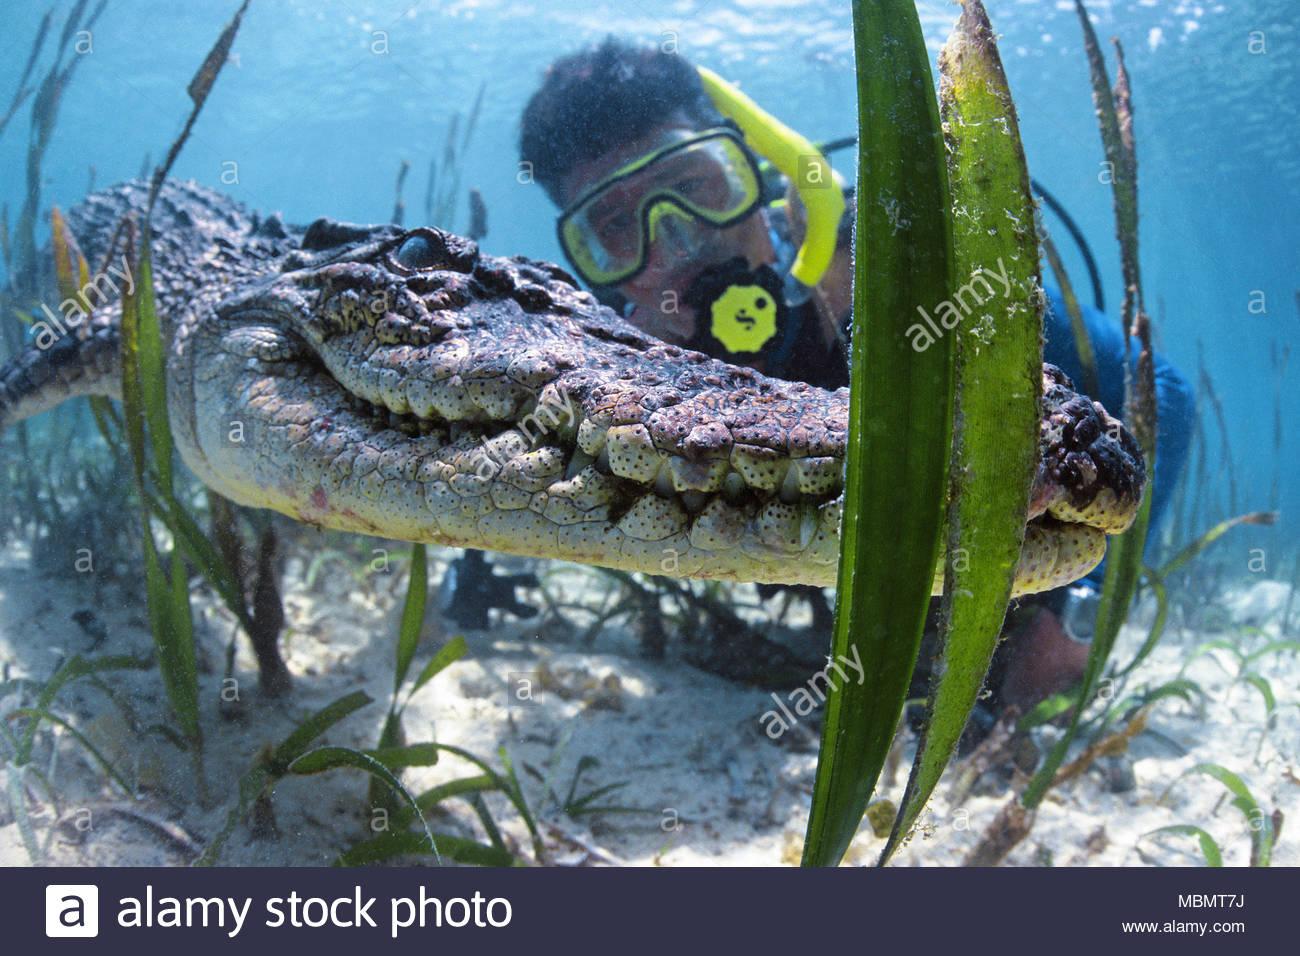 Scuba diver and Saltwater crocodile (Crocodylus porosus), largest of all living reptiles, Palau, Micronesia - Stock Image